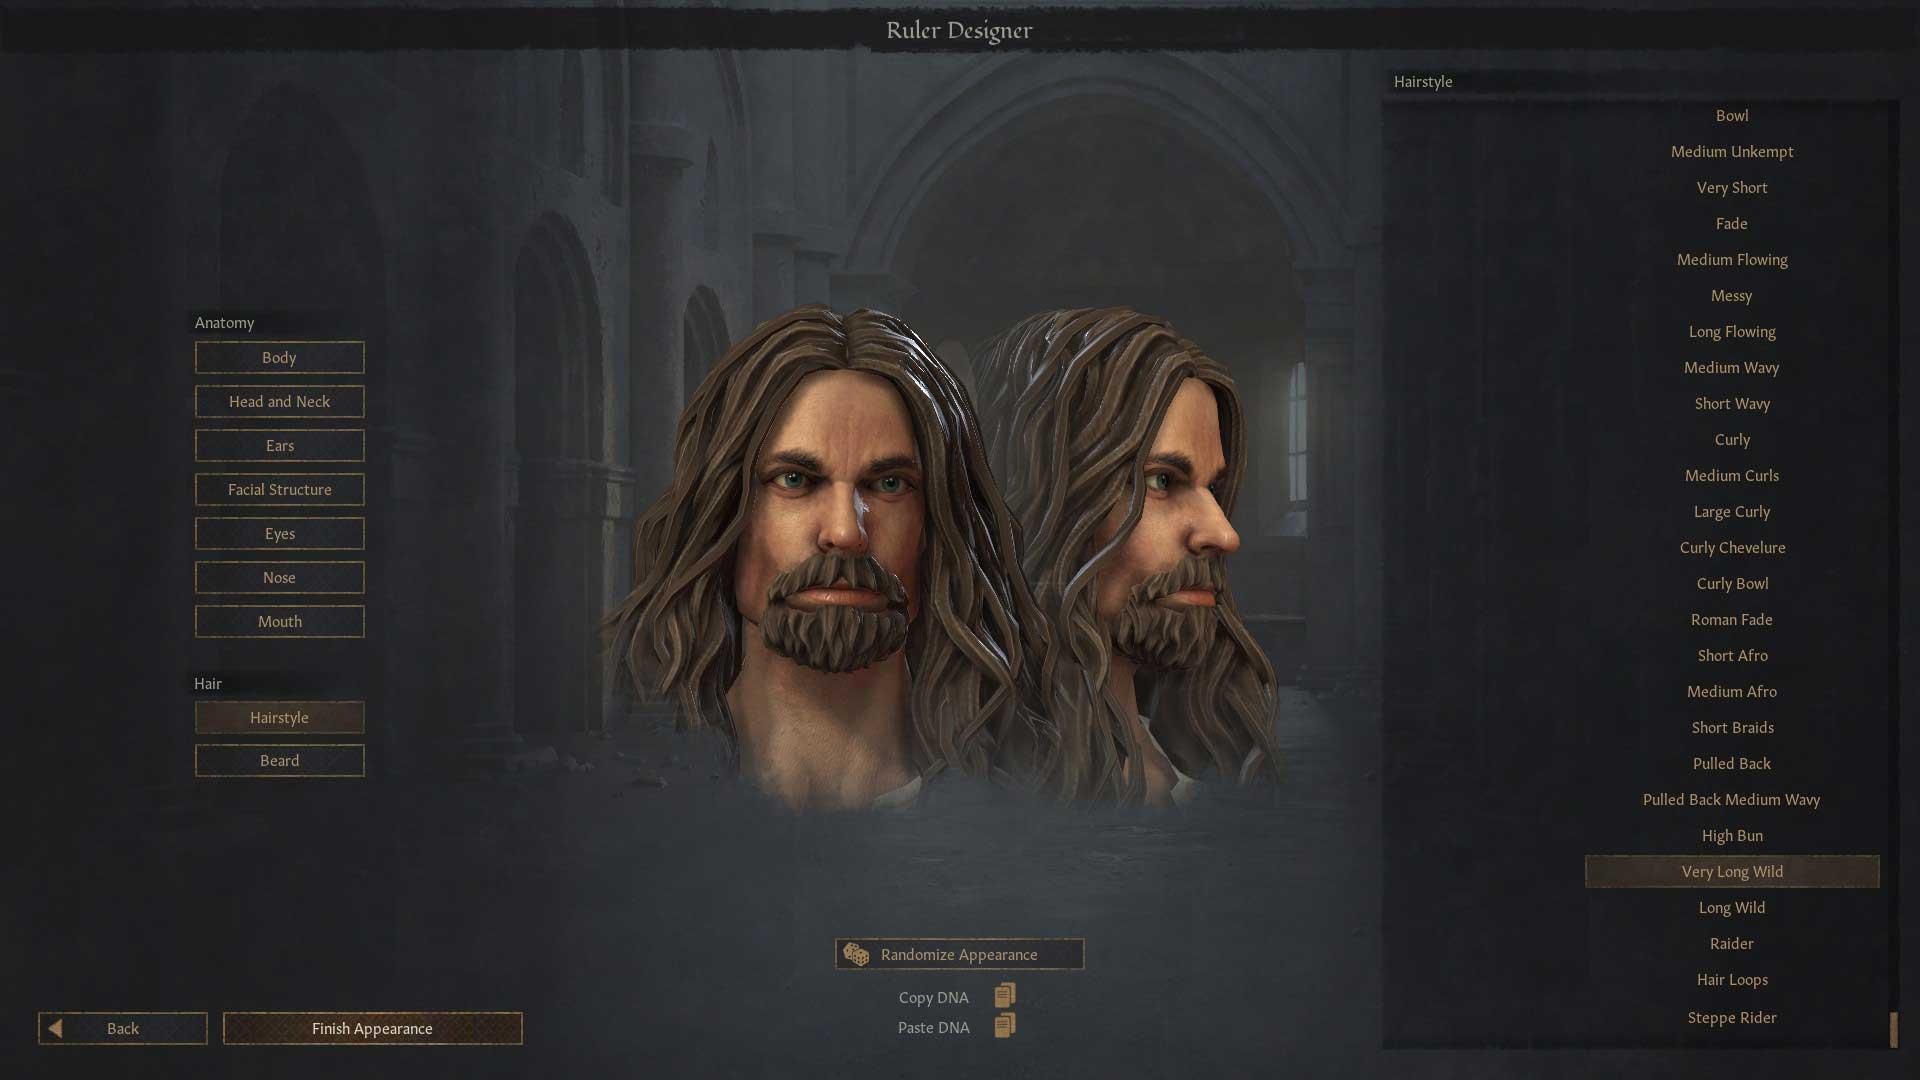 CKIII Ruler Designer Screenshot babt